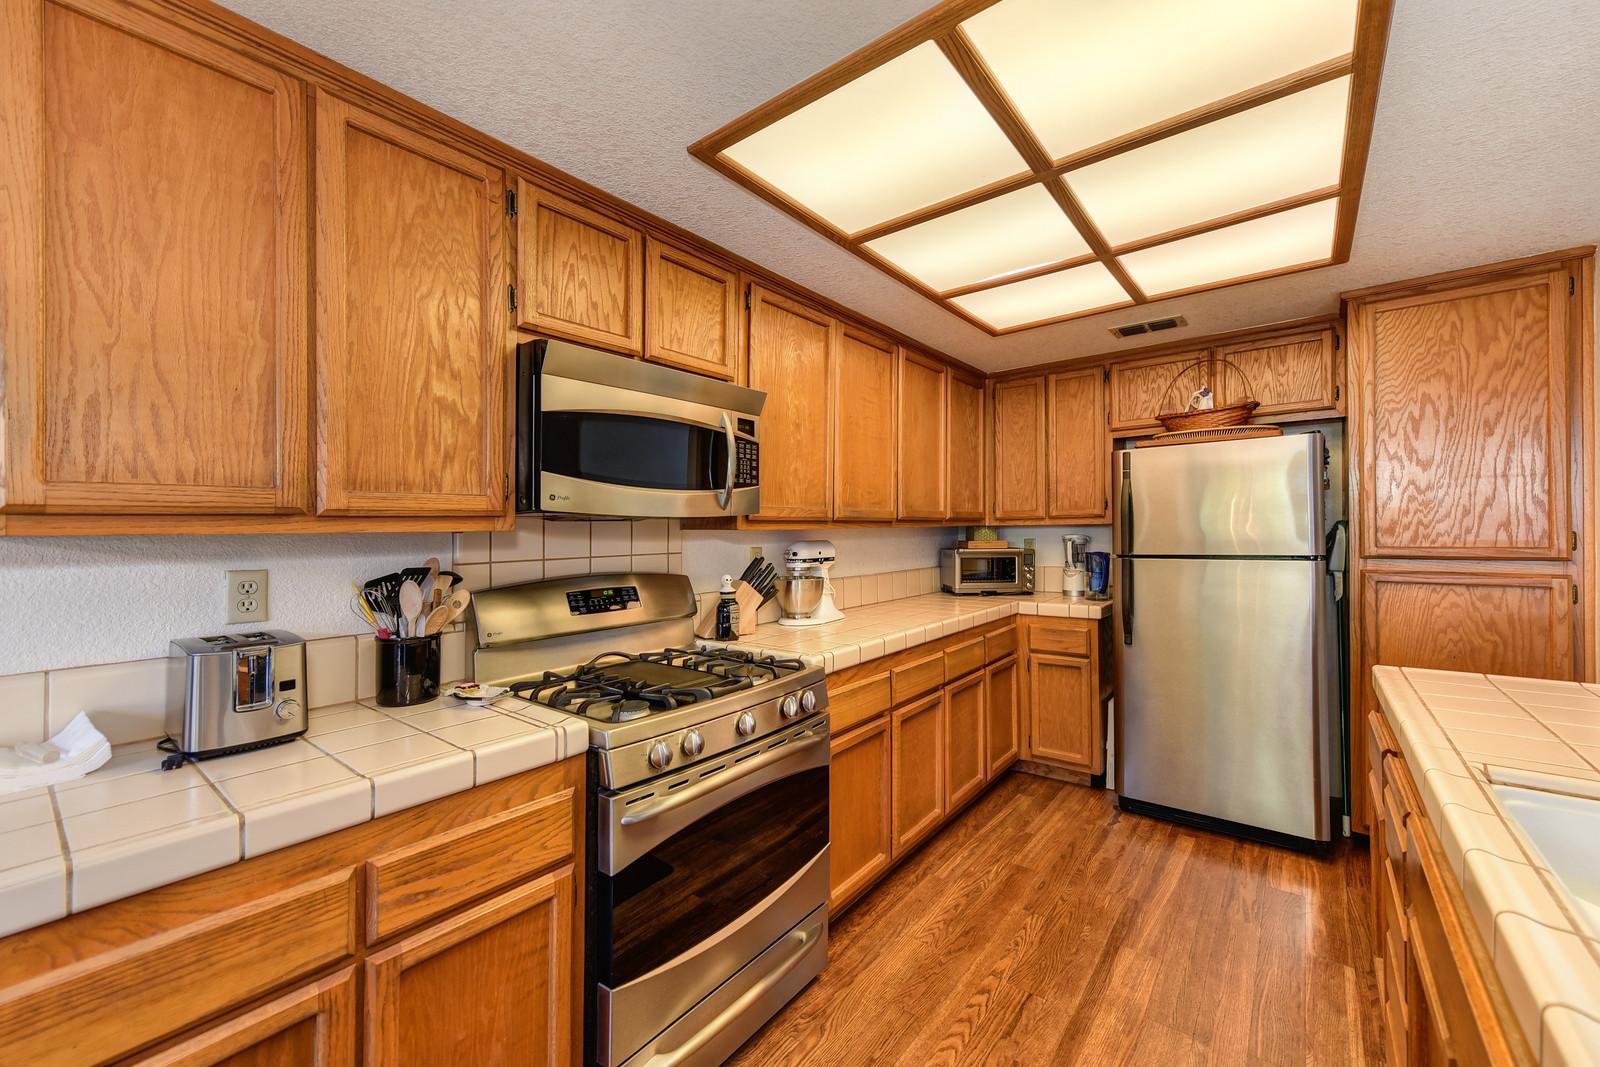 9158 Old Creek Rd kitchen | Keller Williams Realty Elk Grove California